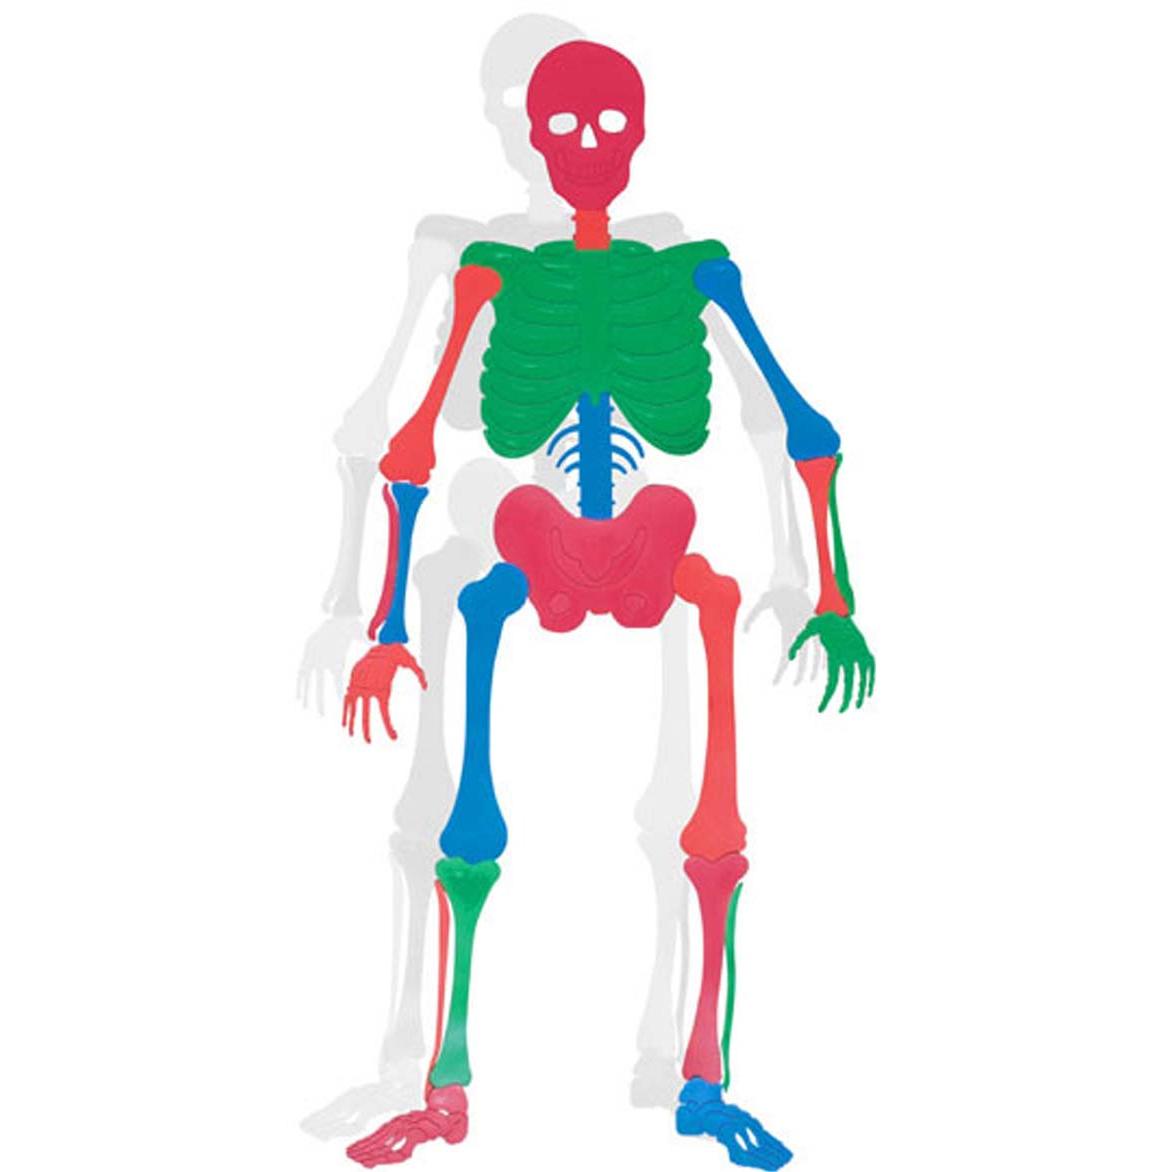 bones_skeleton_educational_poly_floor_puzzle_set